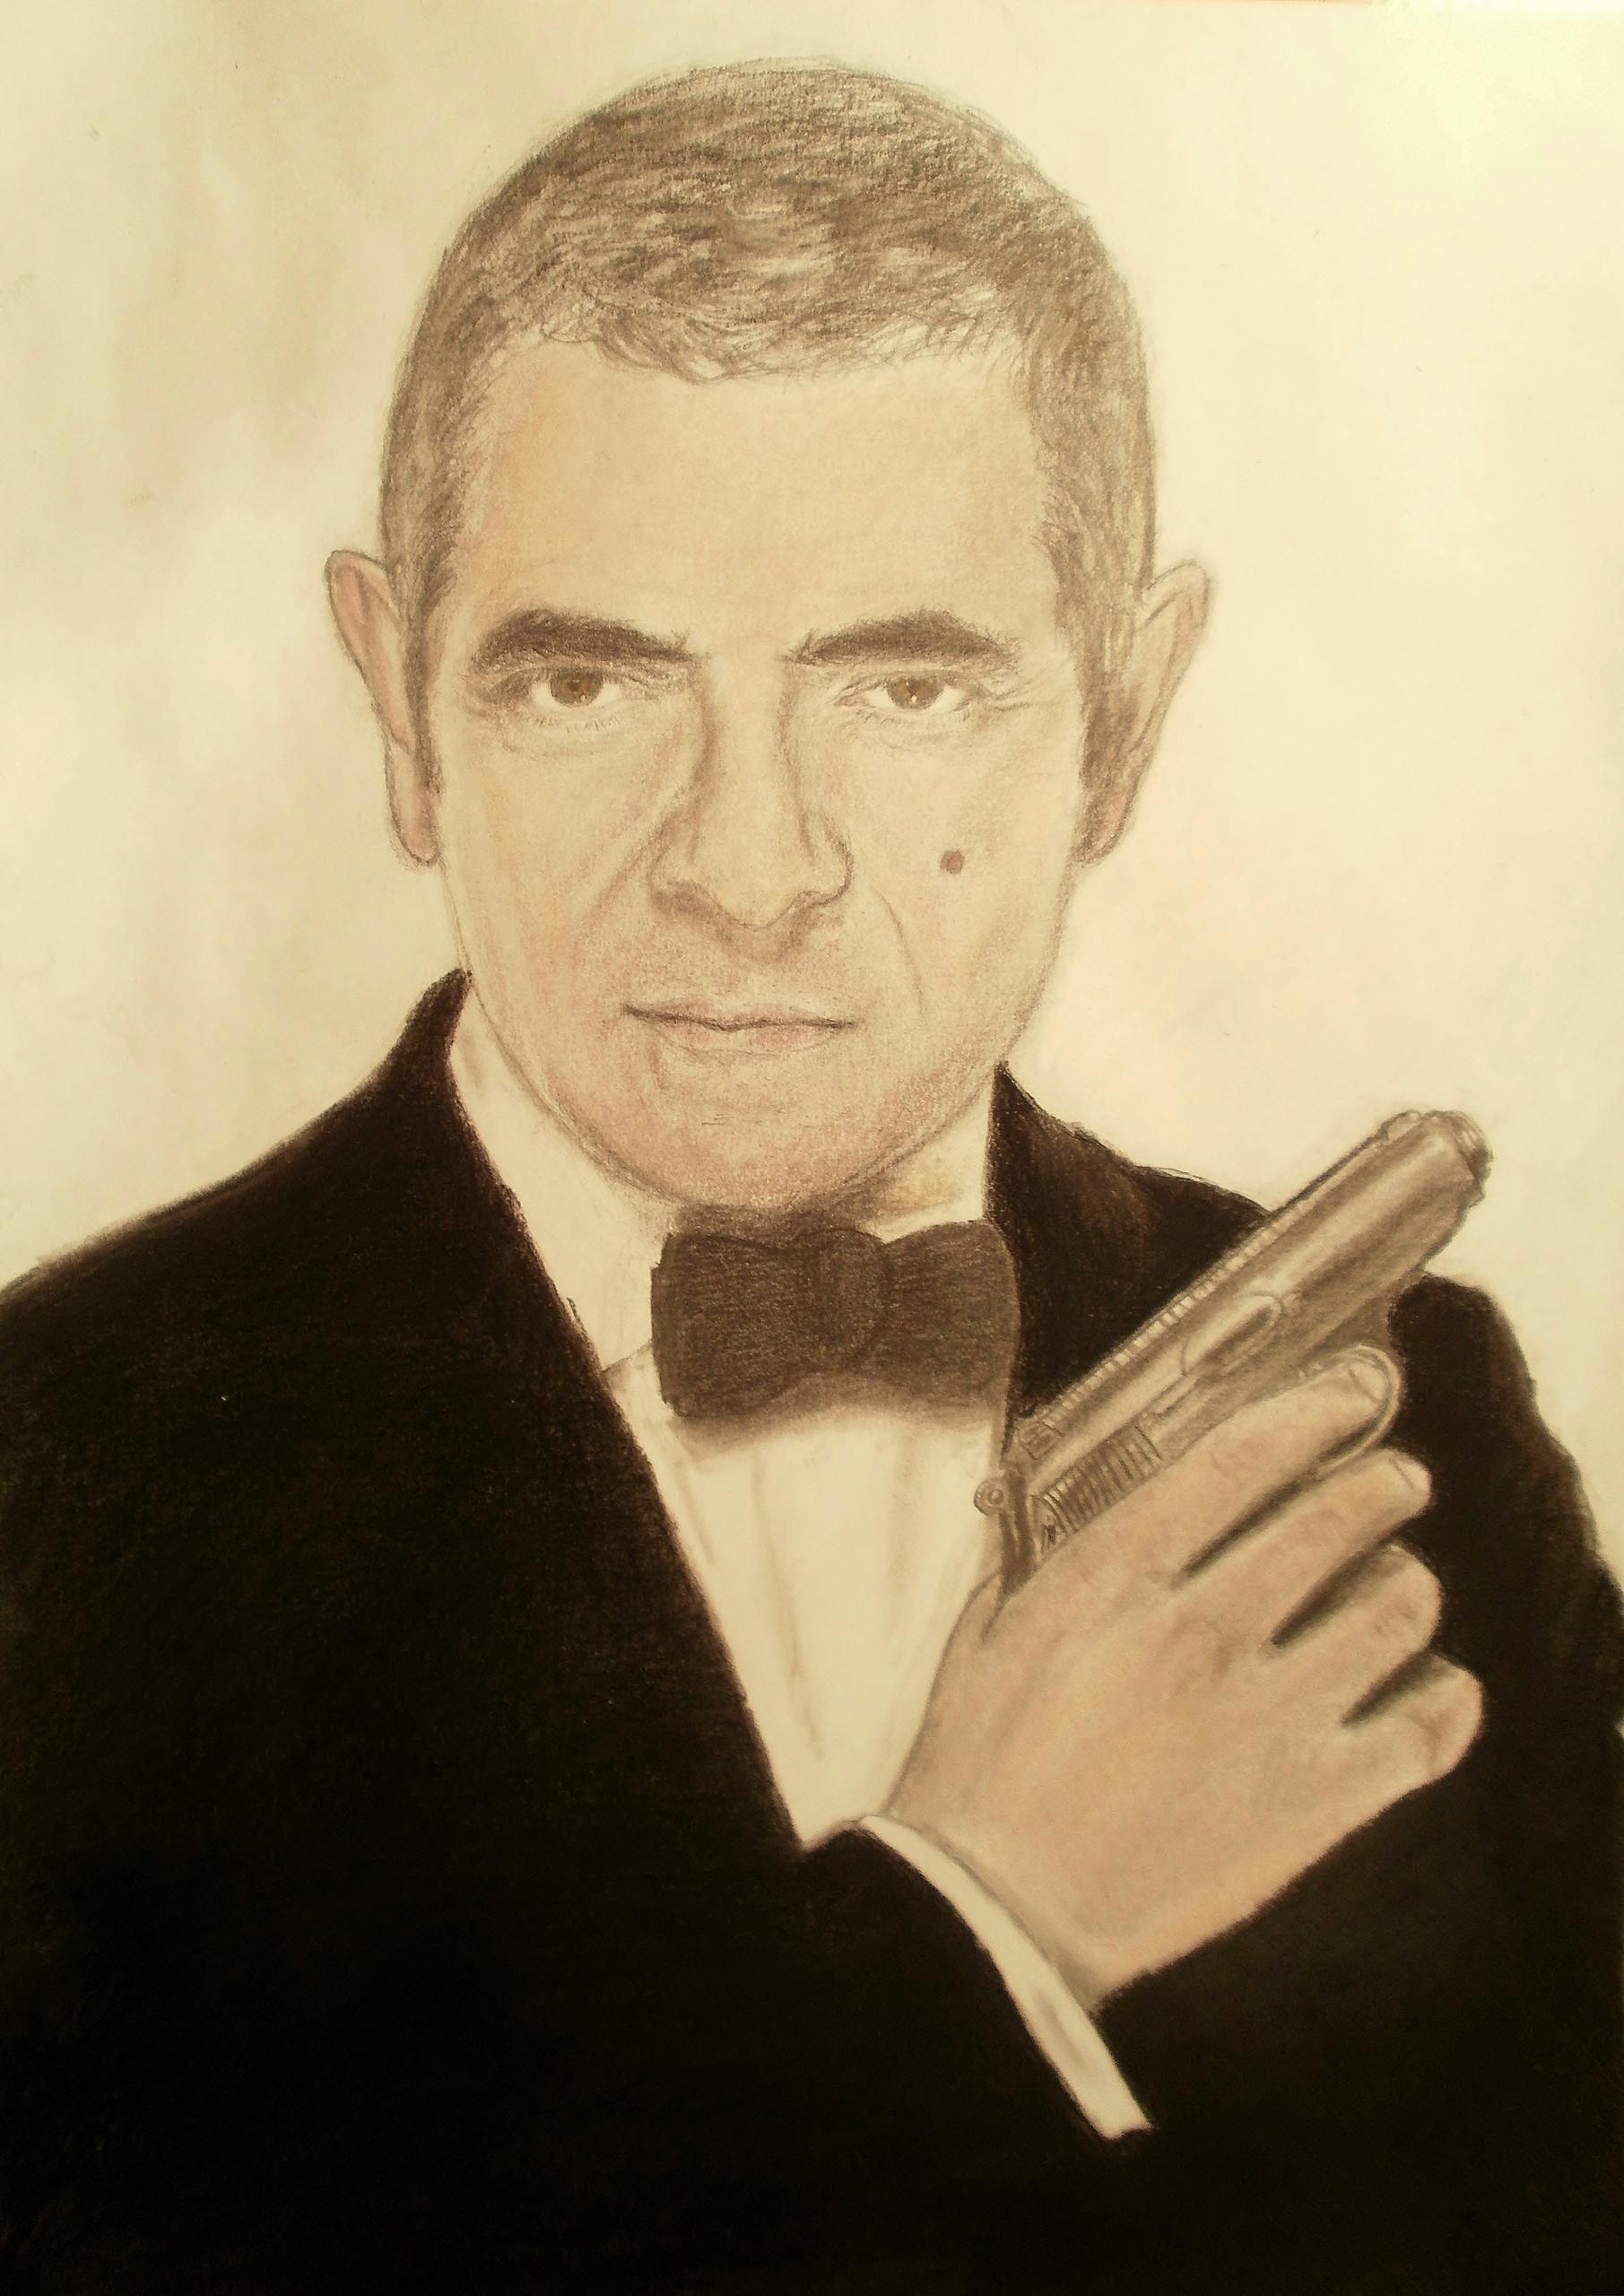 Johnny English drawing